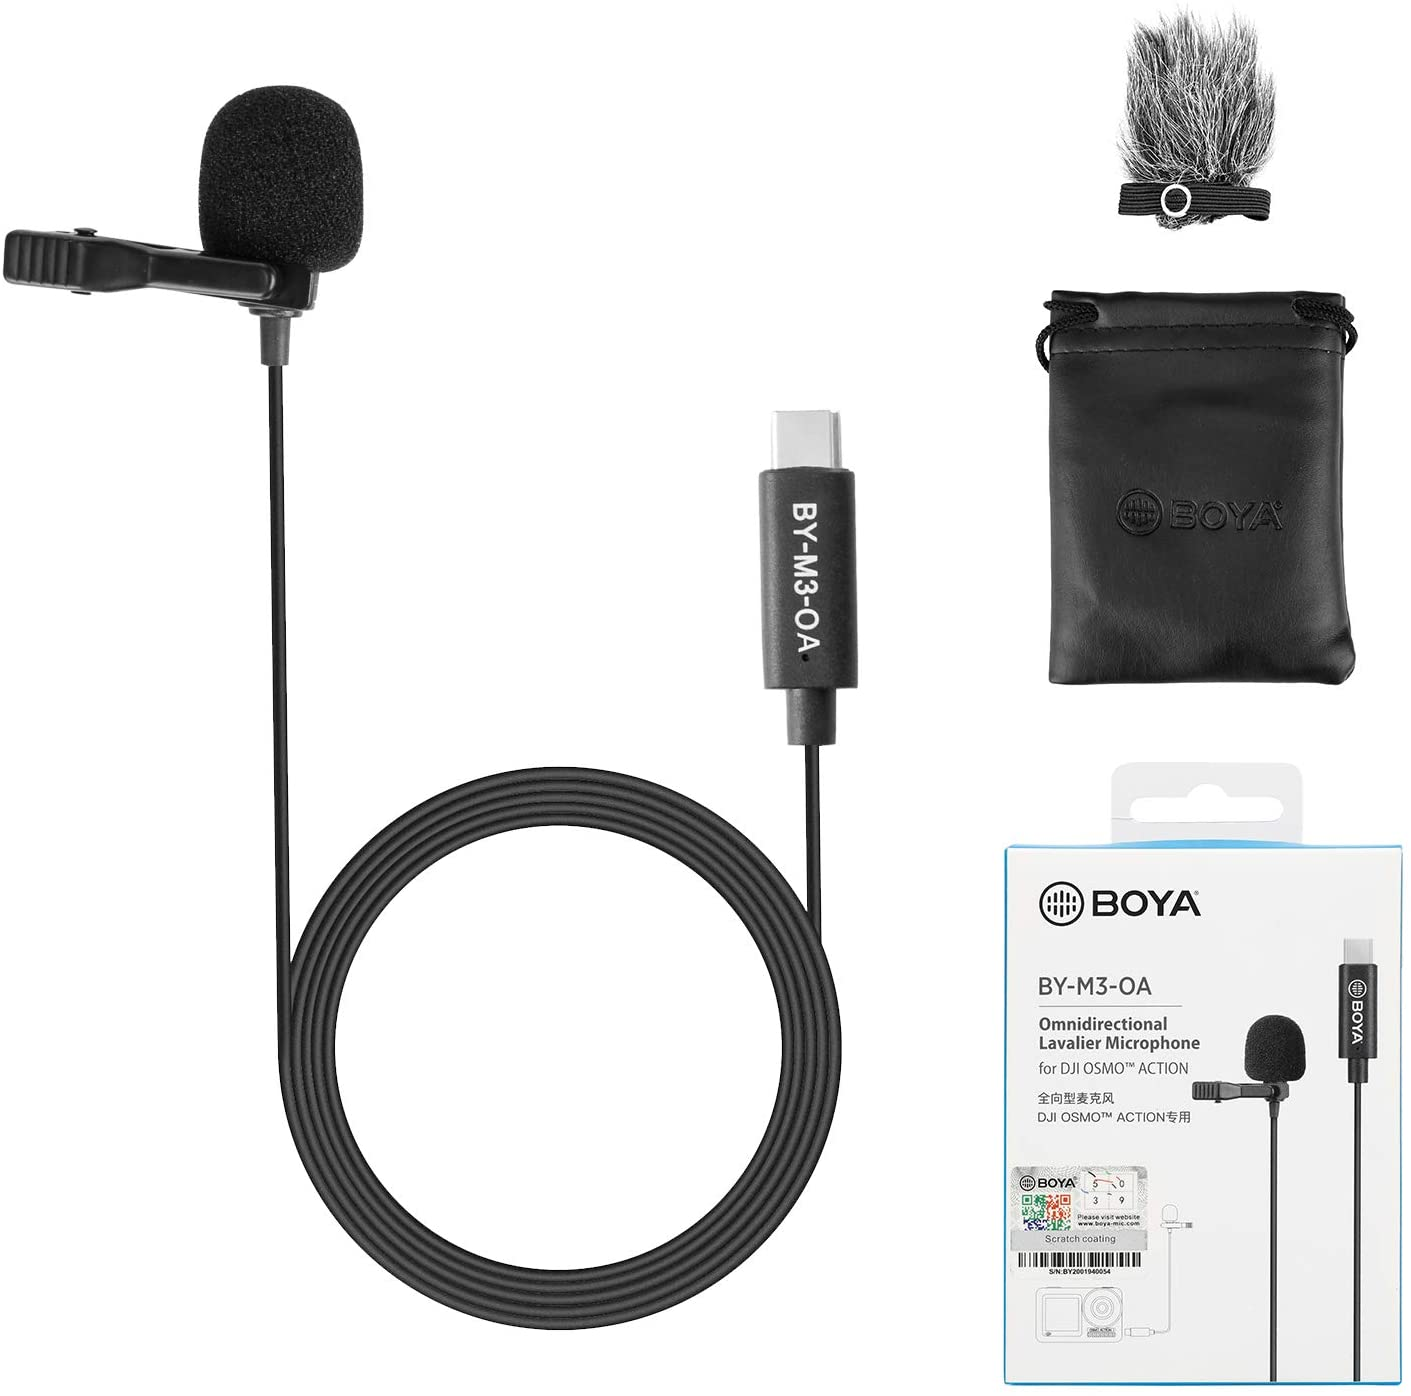 BOYA Plug & Play Omnidirectional Lavalier Microphone for DJI OSMO Action